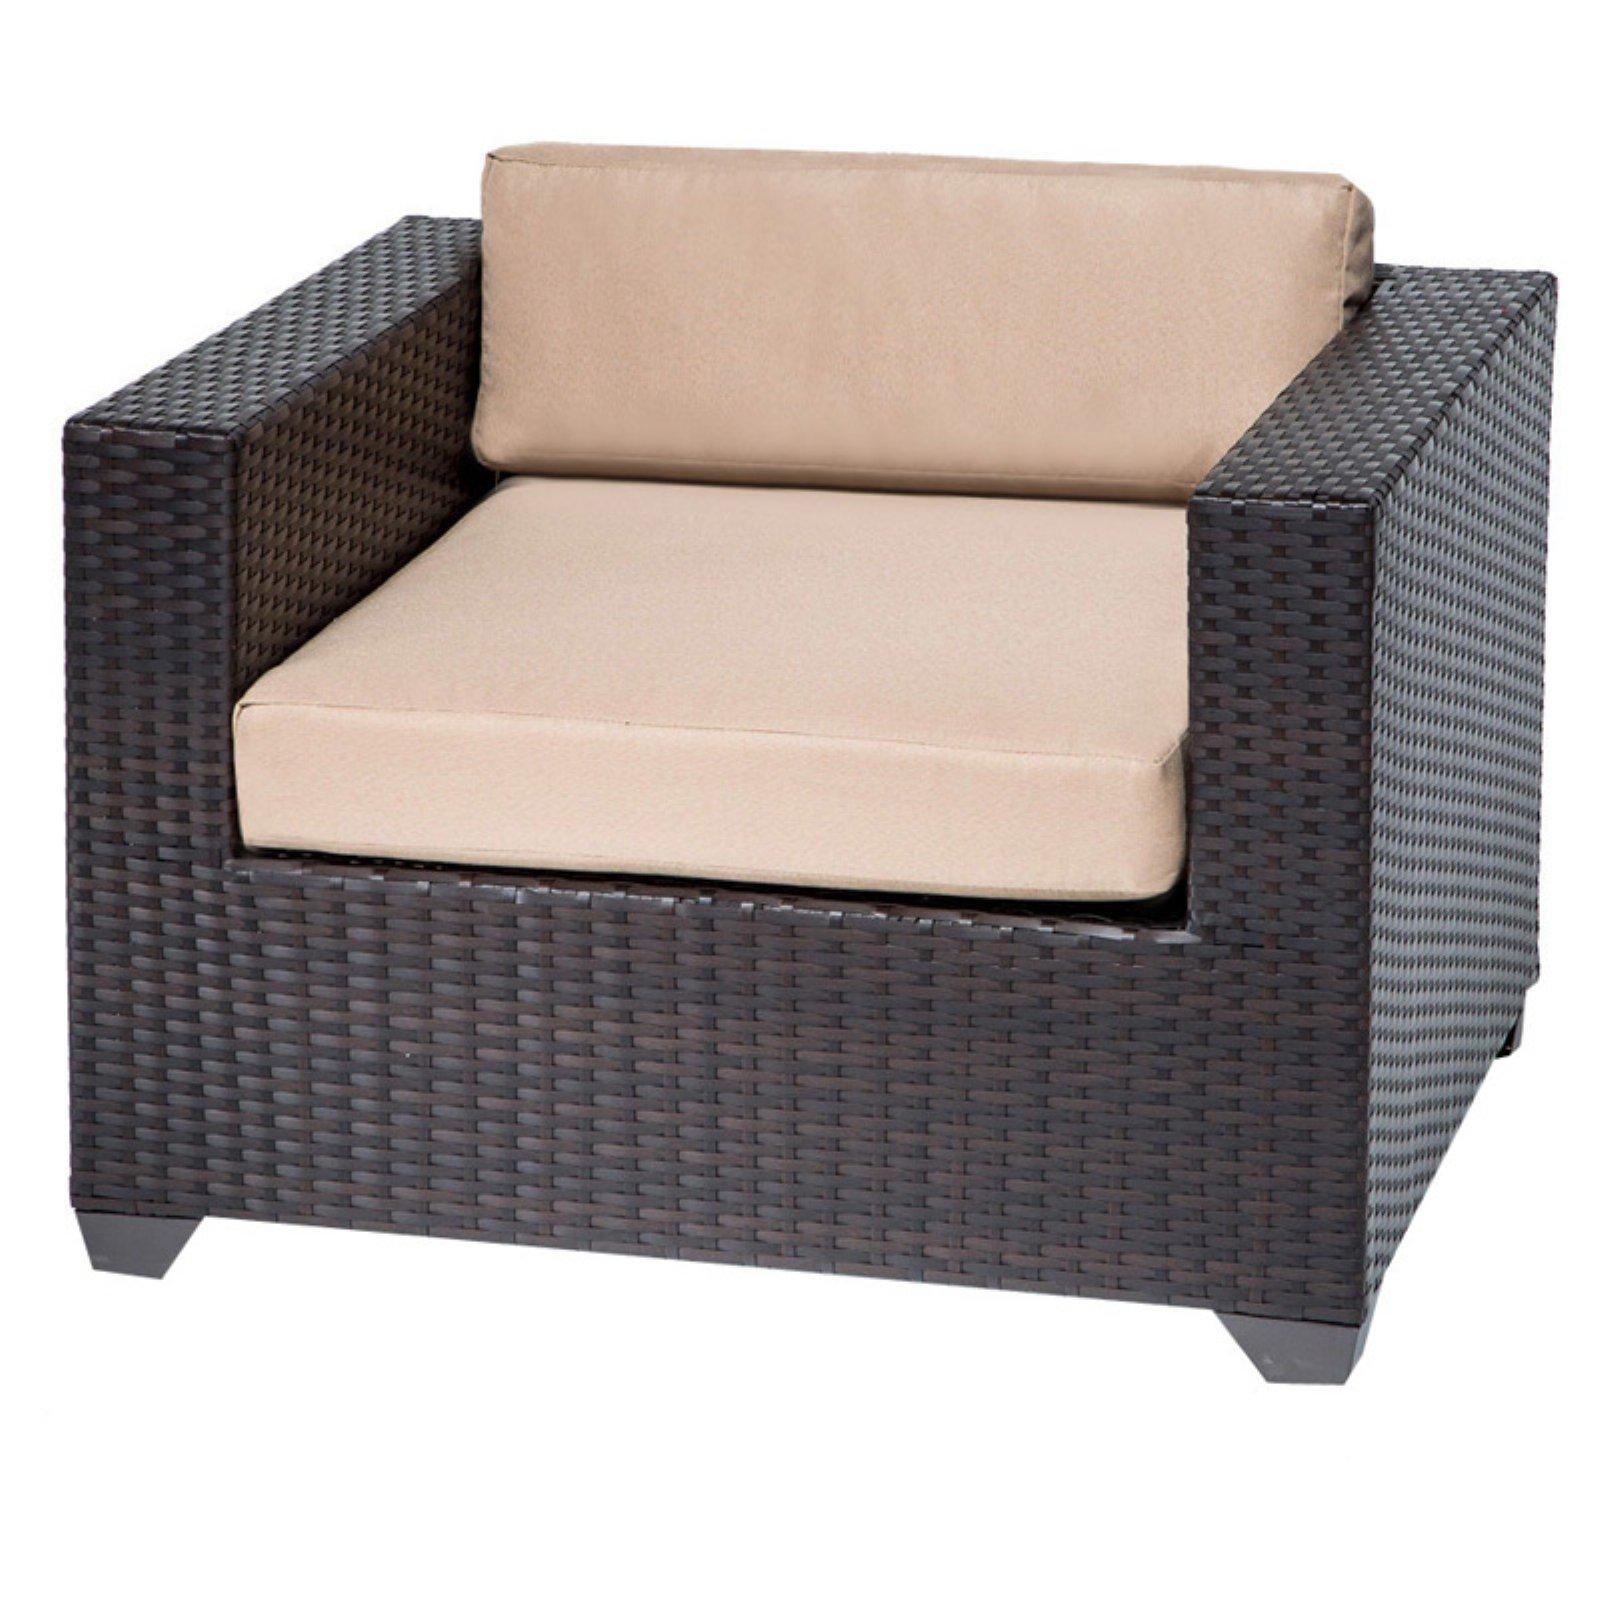 TK Classics Monterey Wicker Outdoor Club Chair